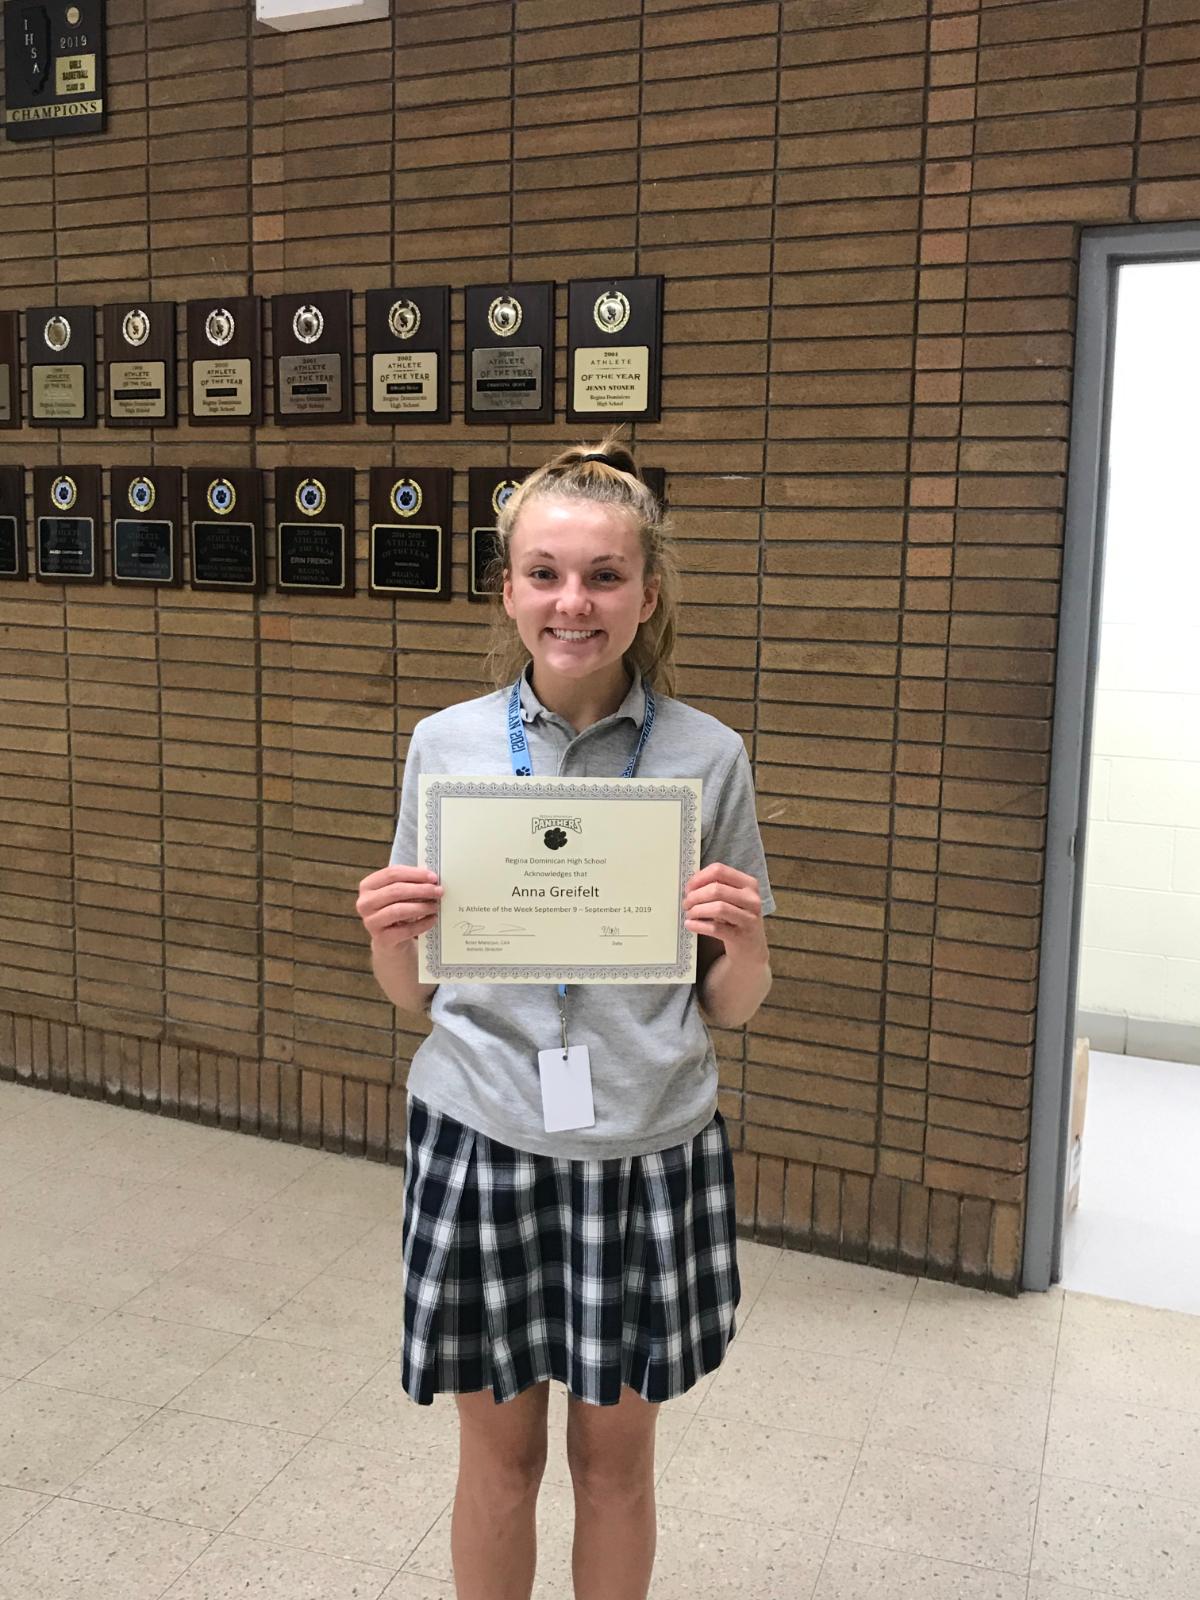 Anna Greifelt Named Athlete of the Week for the Week of September 9-14